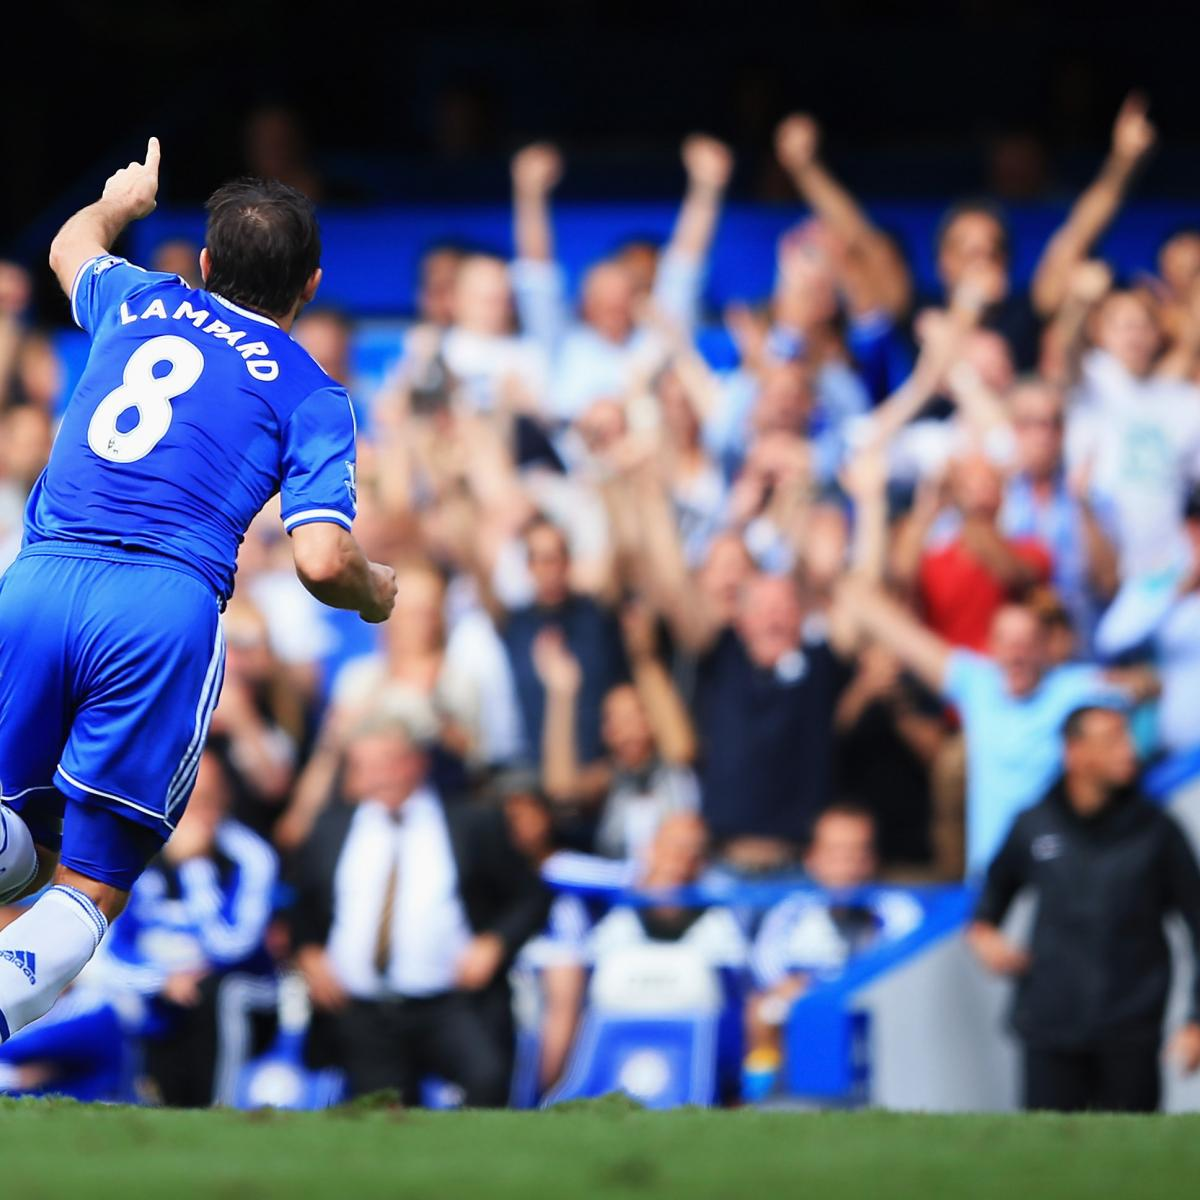 Psg Vs Manchester City Live Score Highlights From: Chelsea Vs. Hull City: Premier League Live Score